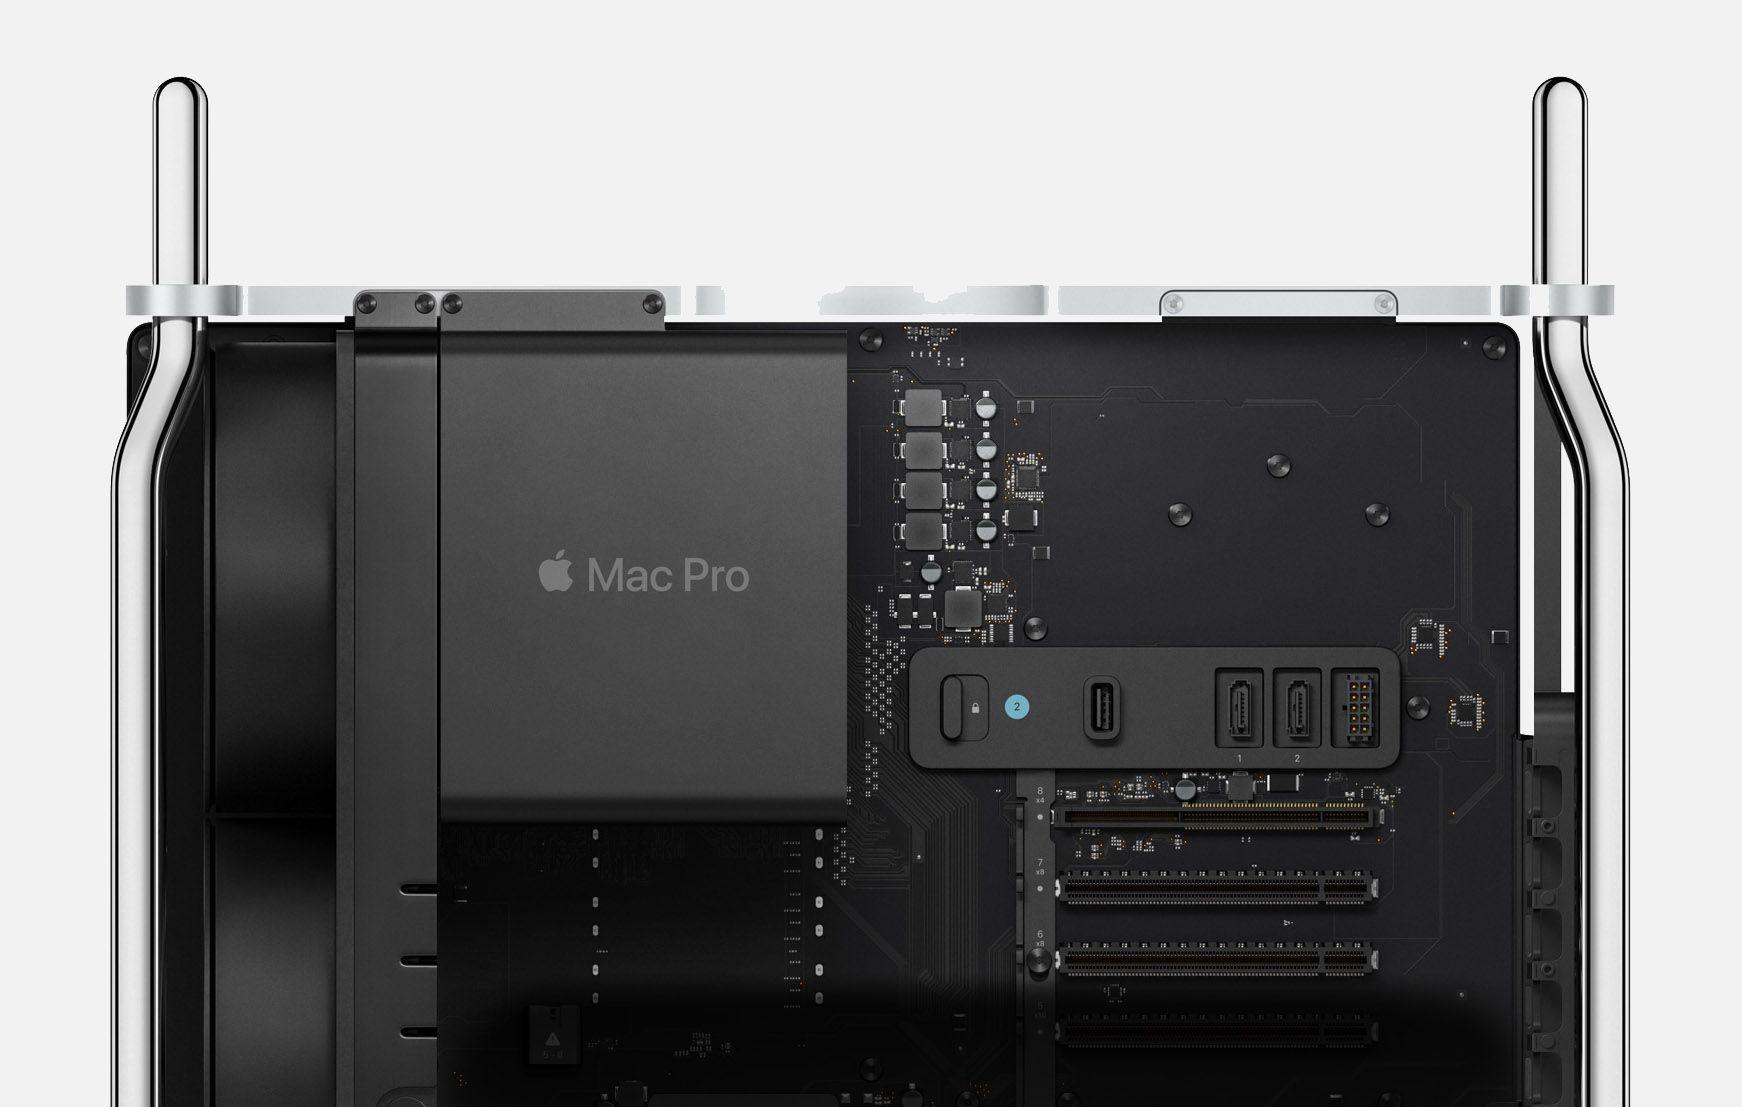 Parte superior de un Mac Pro sin la caja protectora